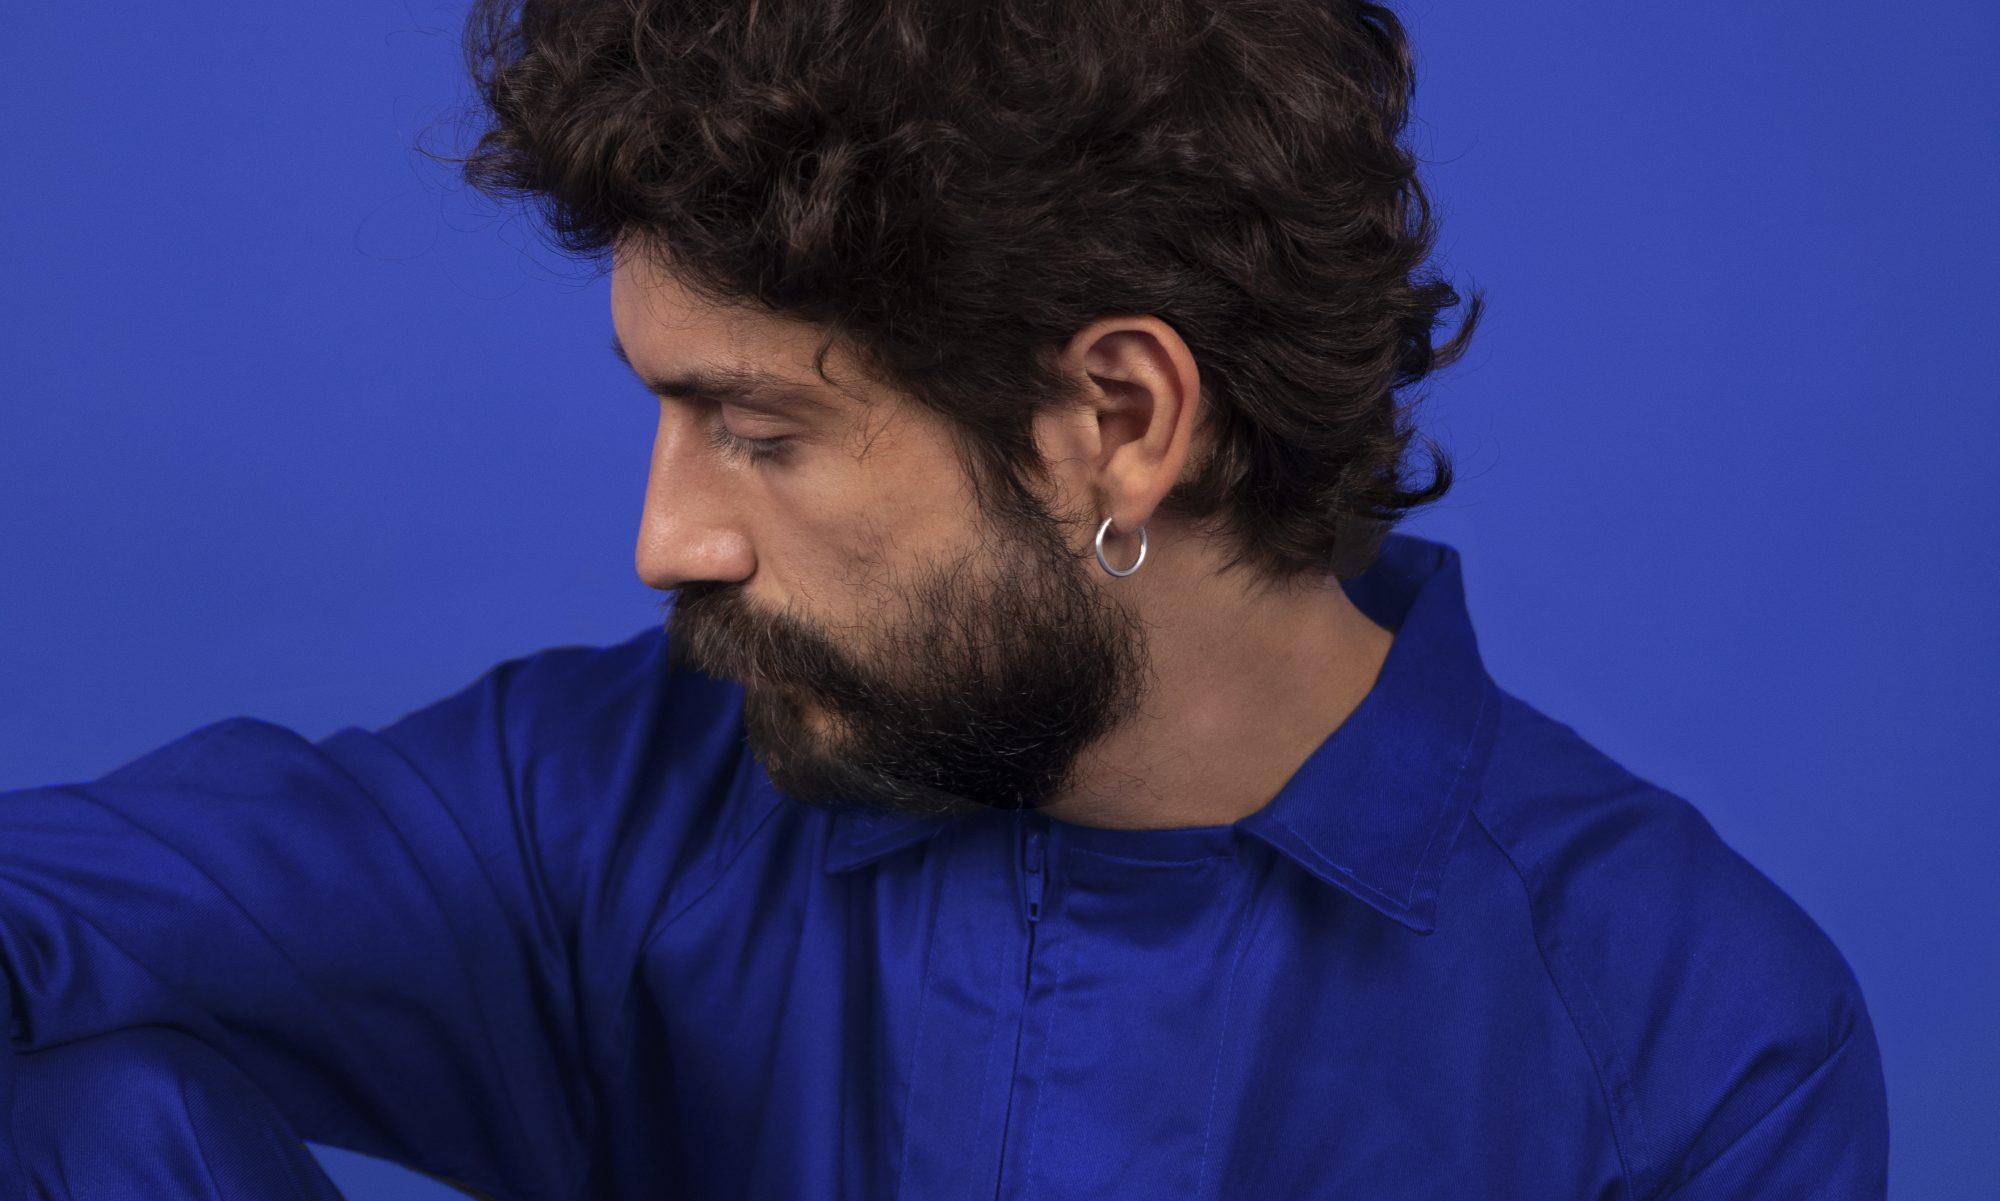 Pedro Melo Alves